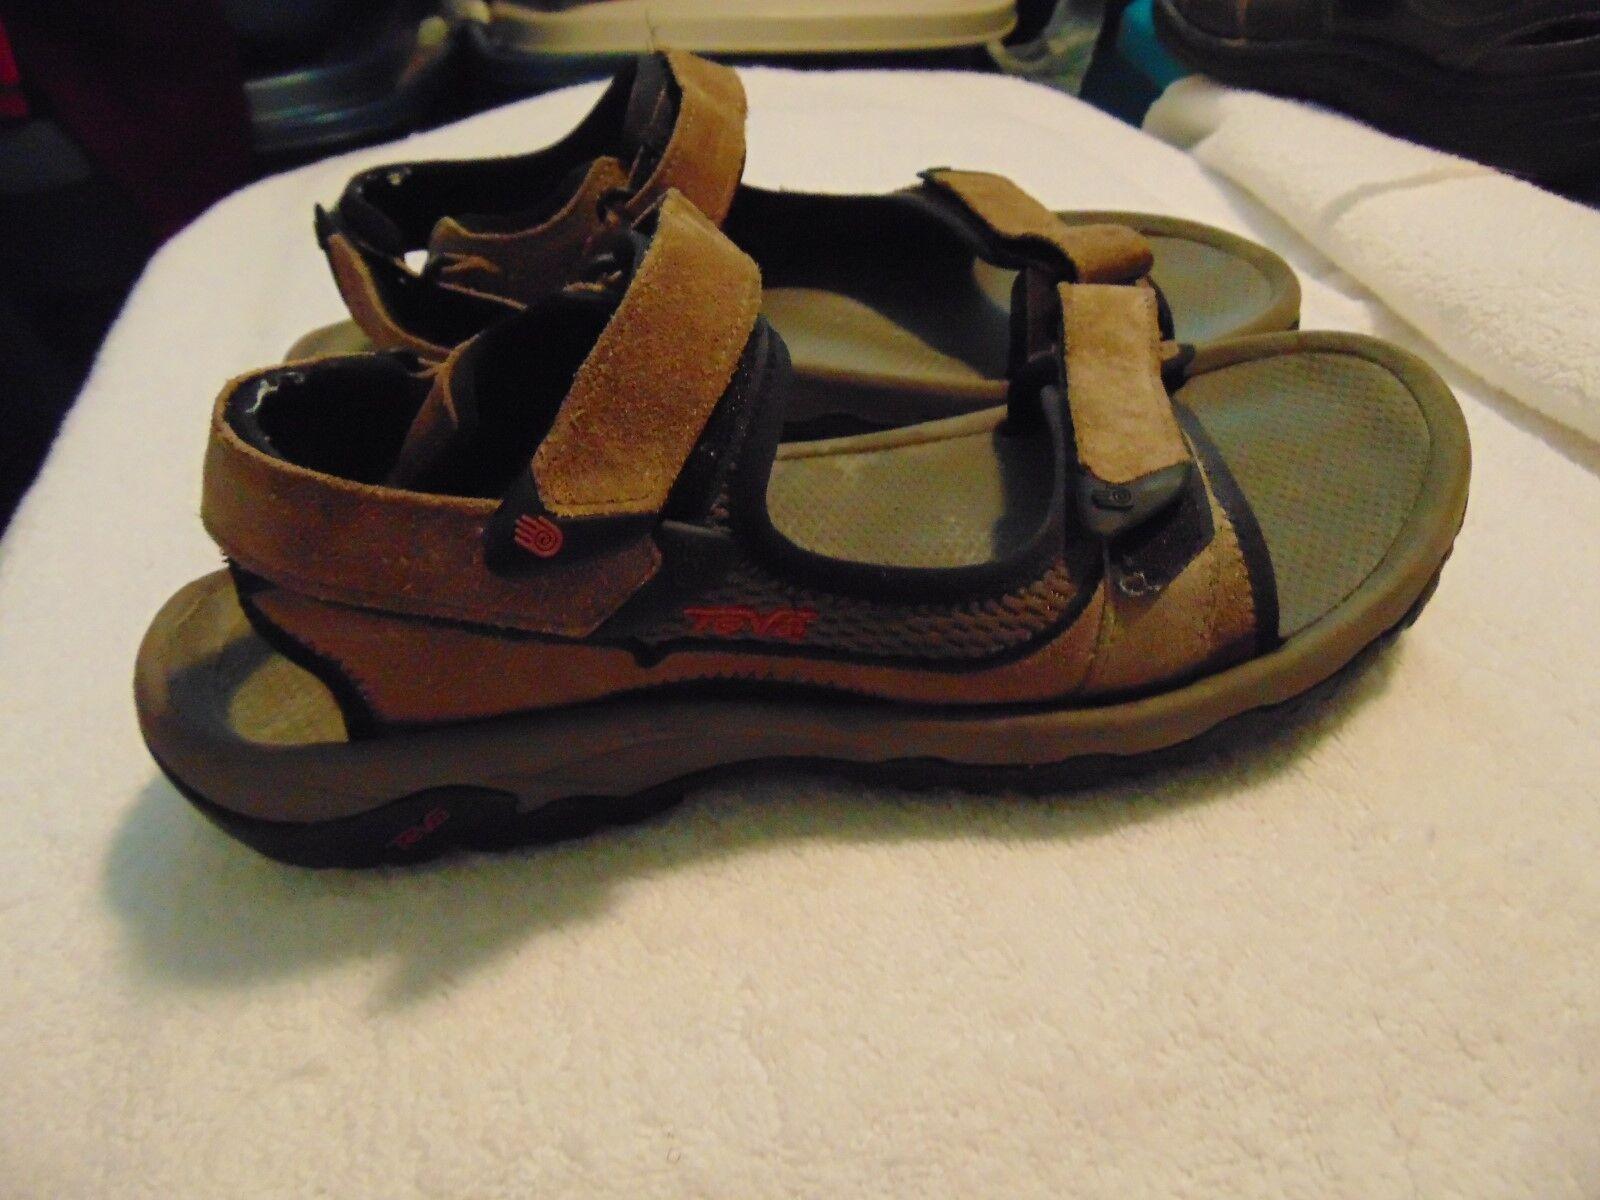 Men's Teva Light Brown Suede Leather Adjustable Strappy Sandals-10-S N